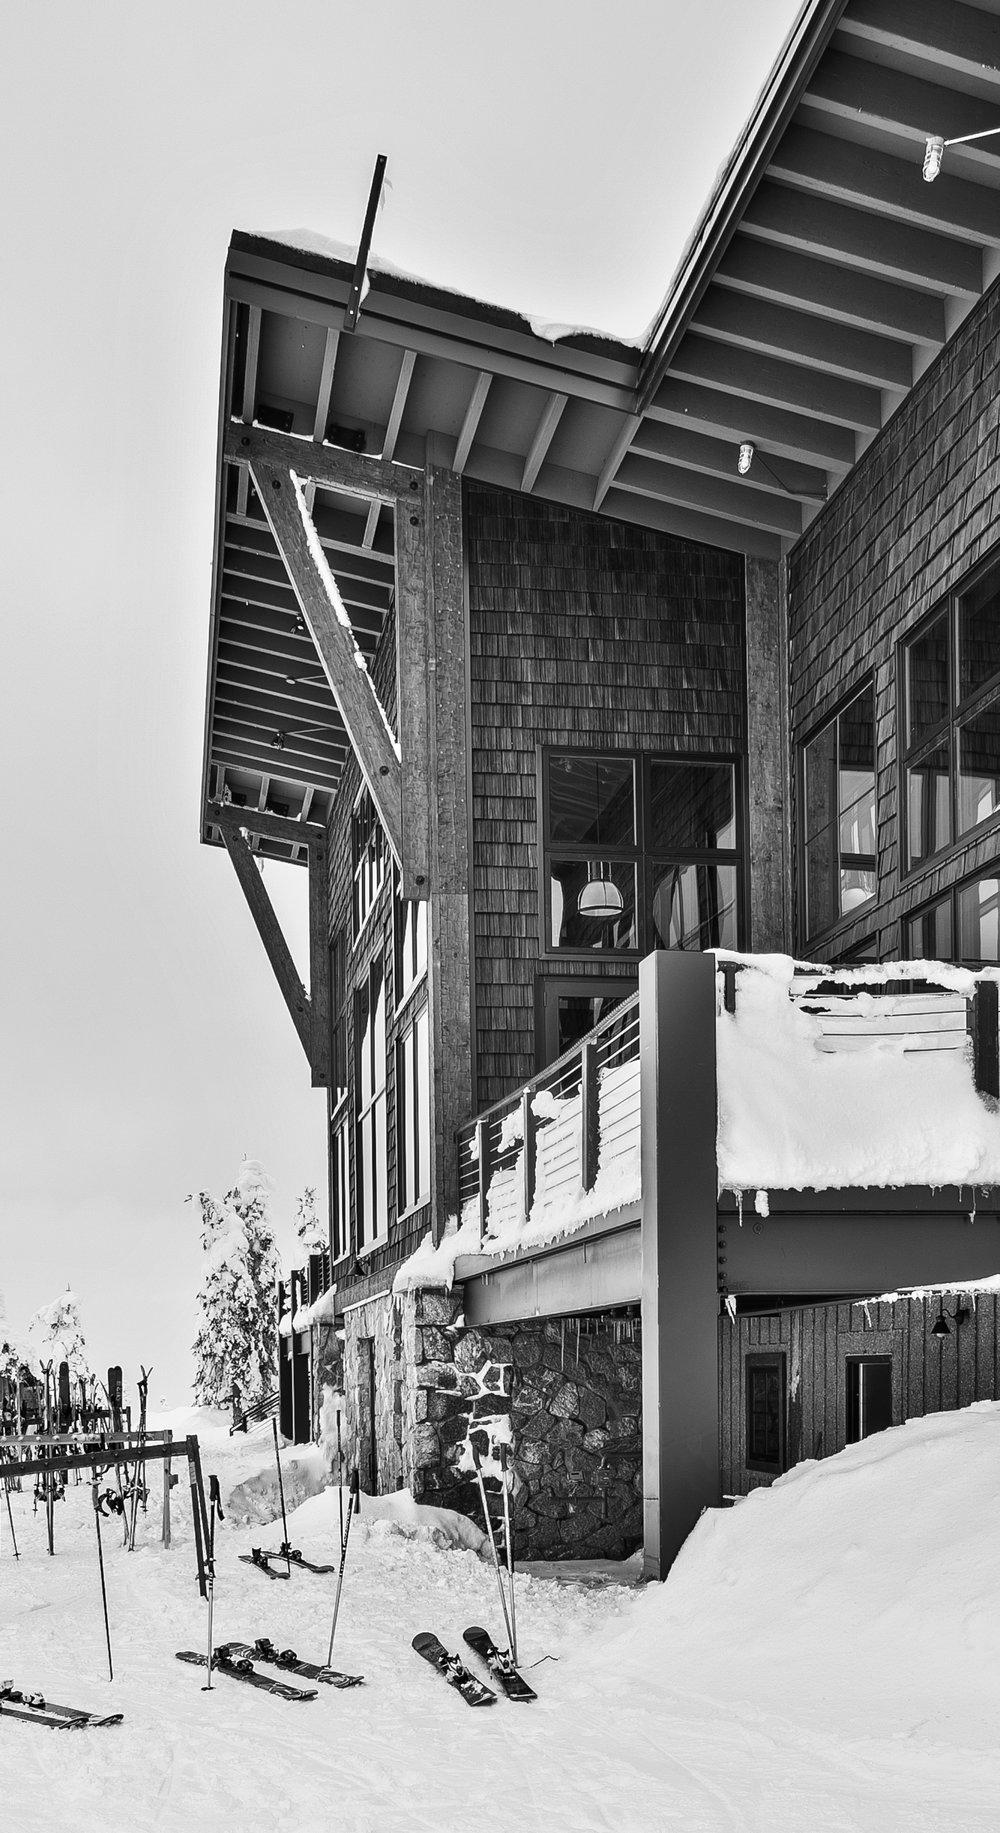 Schweitzer-black-white-Resort-Skis.jpg